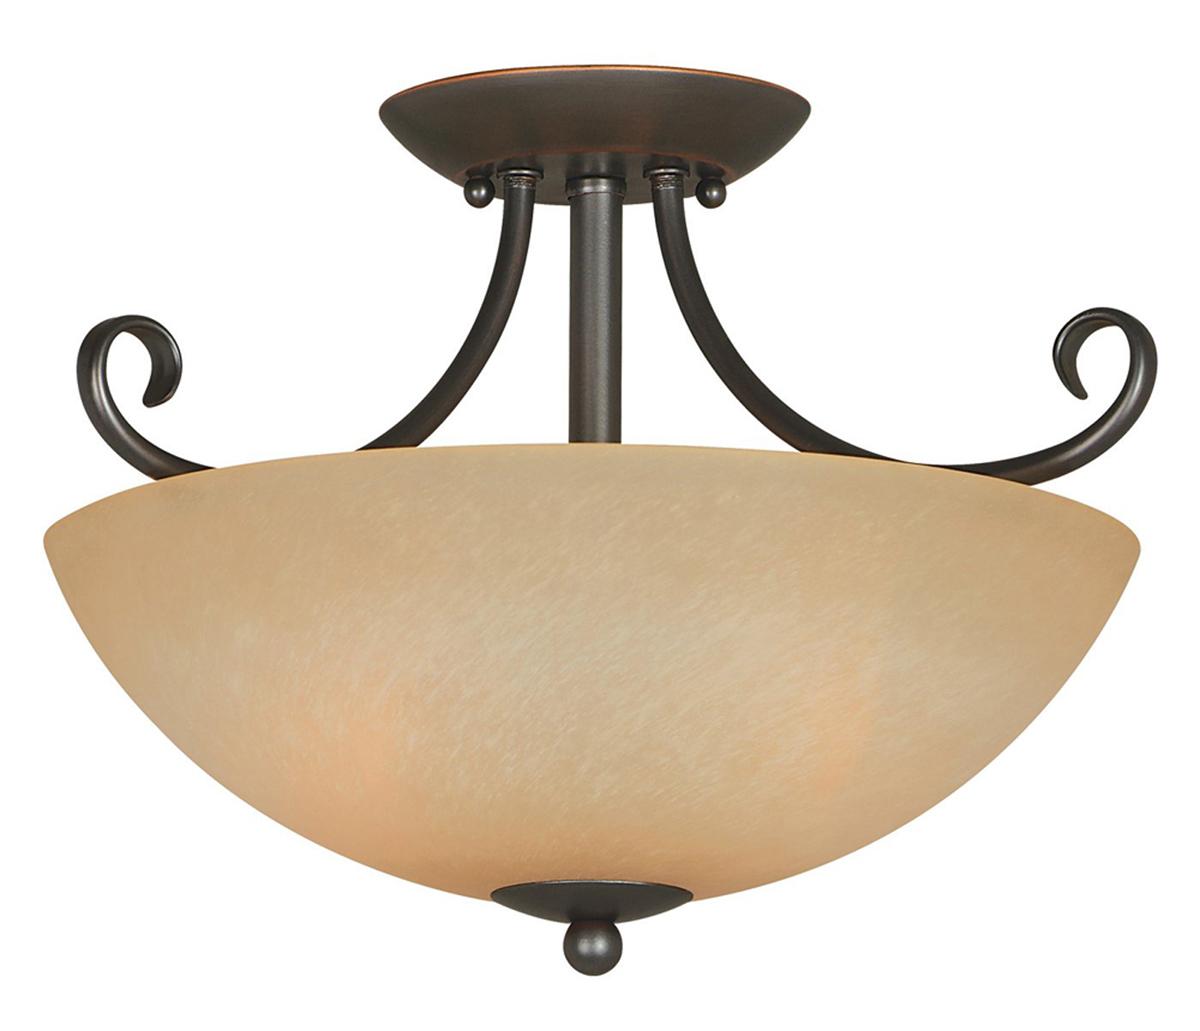 Berkshire 2 Lights Semi-Flush Ceiling Light Fixture, Classic Bronze, Amber Glass Shade